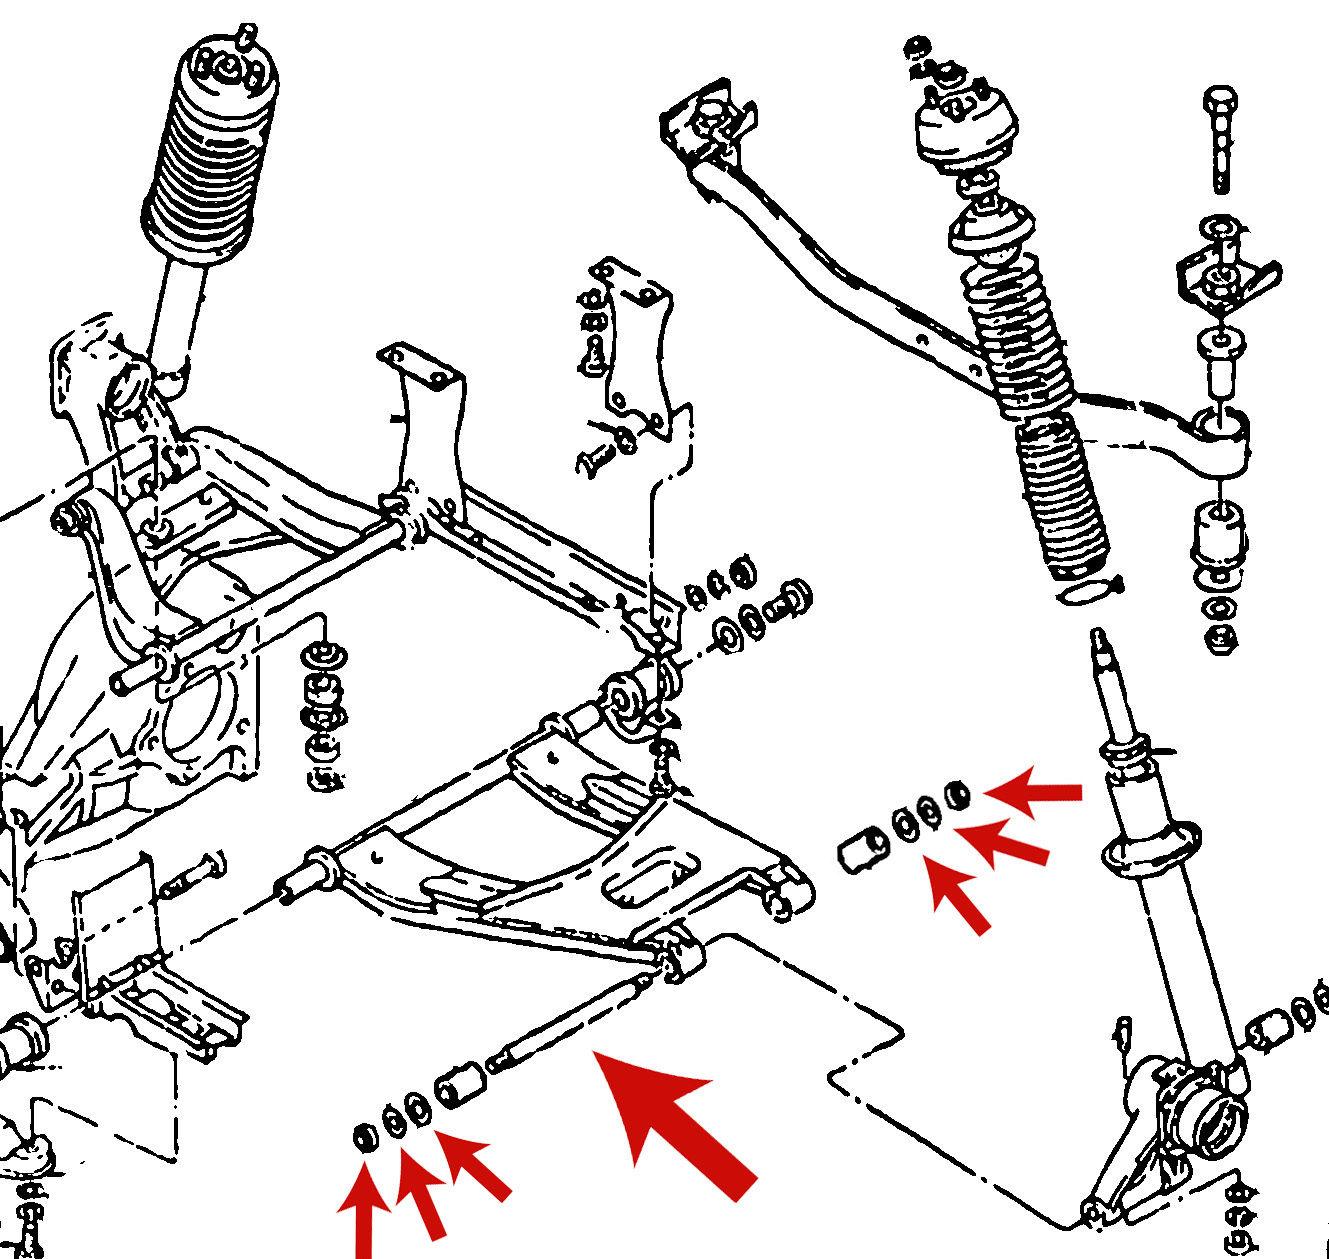 Datsun 240z 260z 280z Rear Suspension Spindle Rod Pin Kit